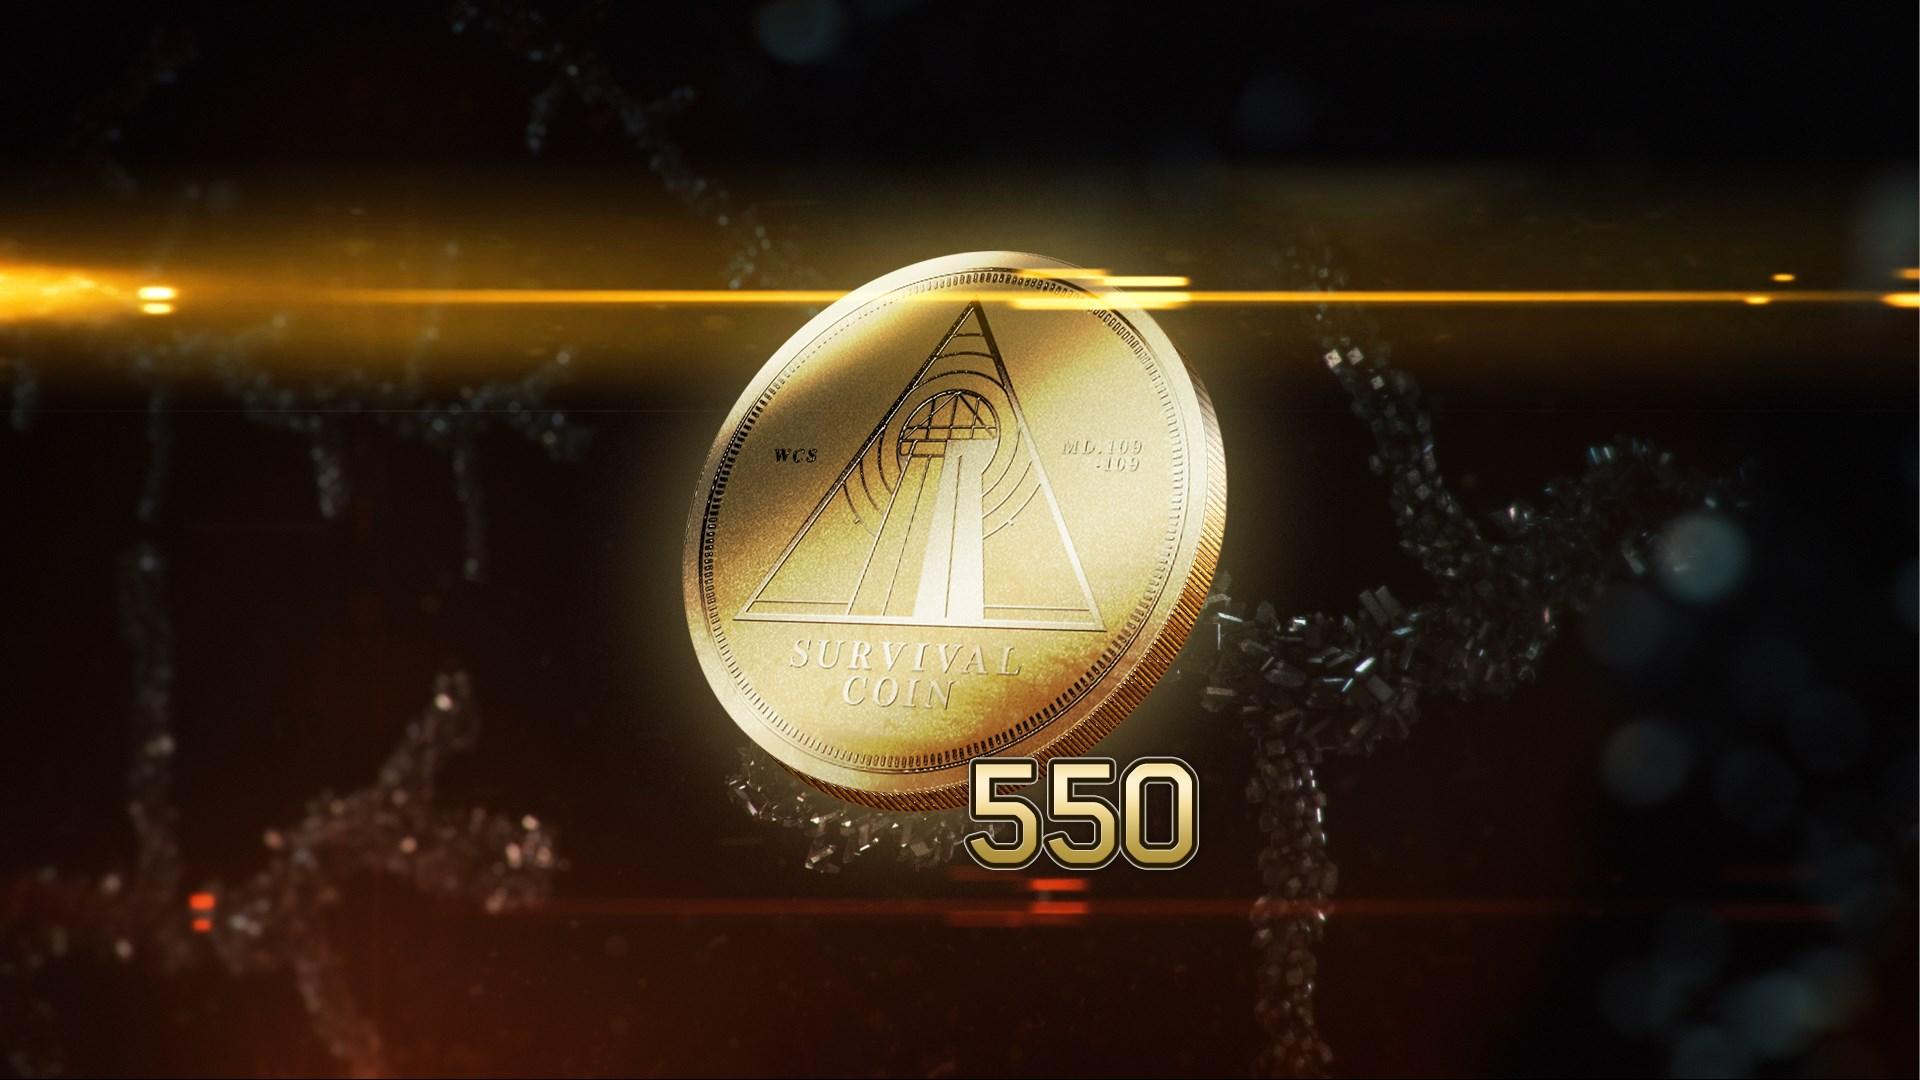 550 SV COINS